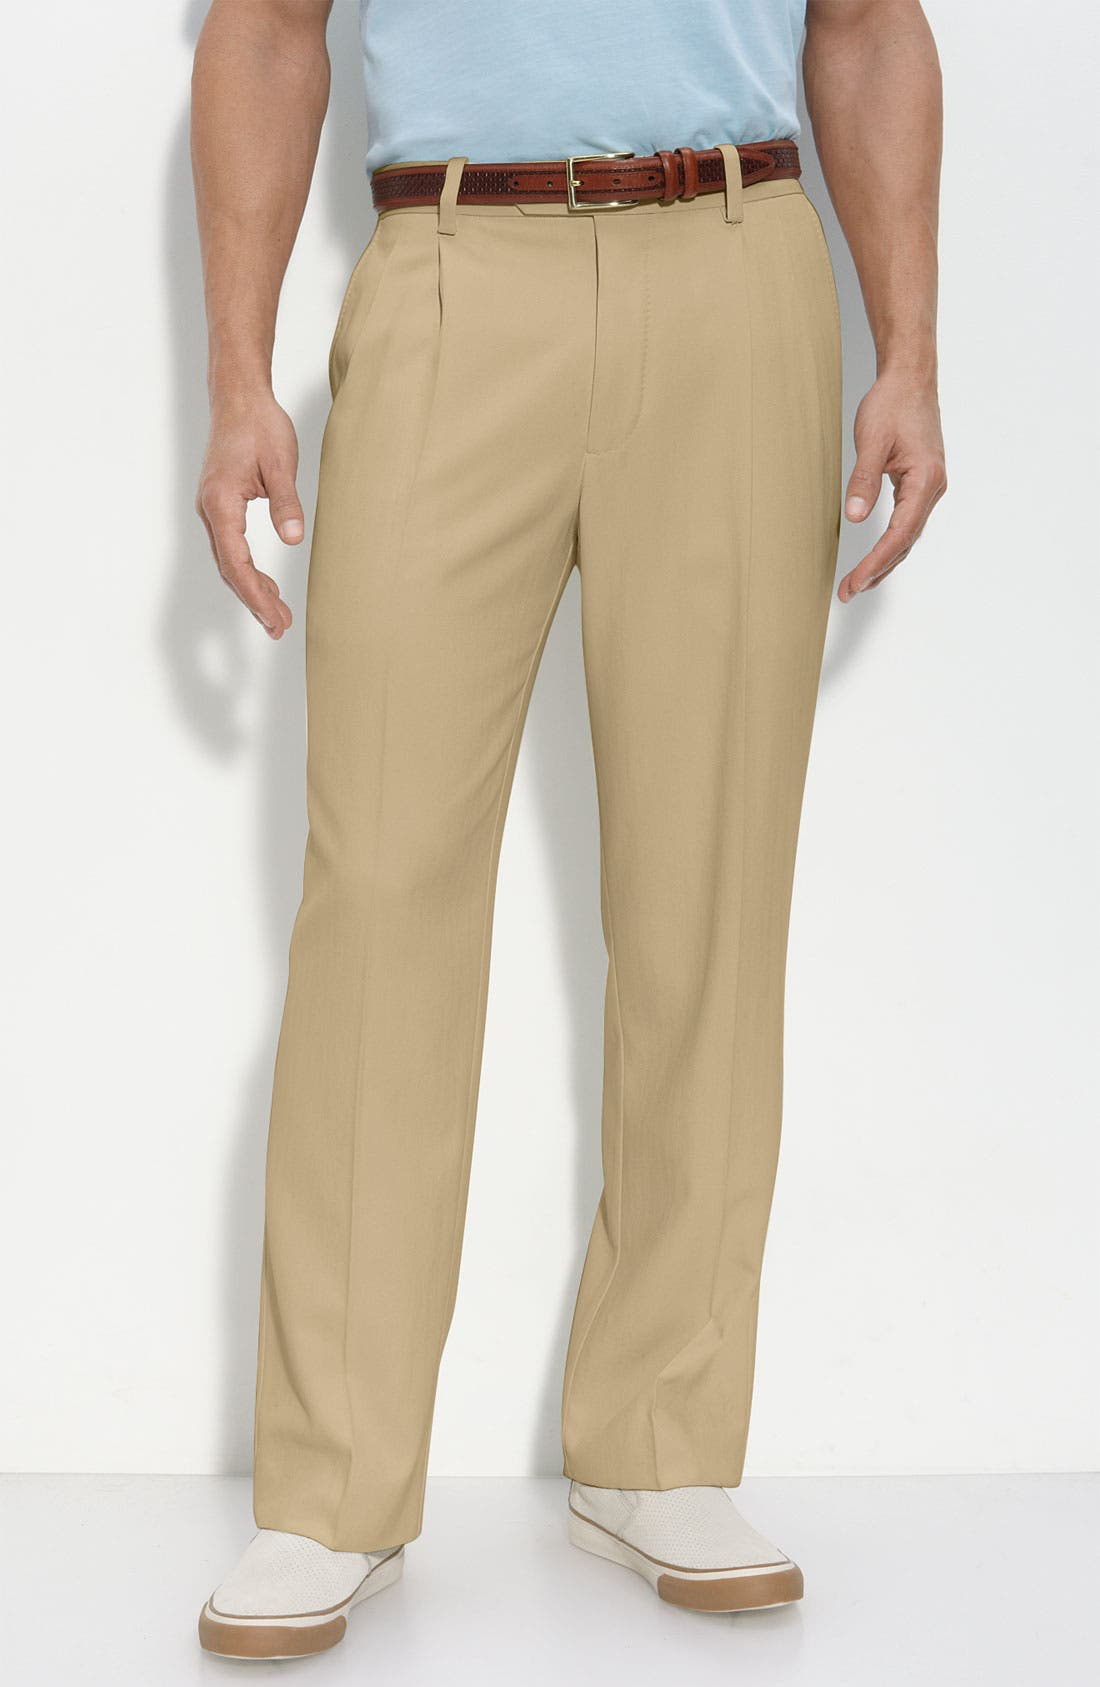 Alternate Image 1 Selected - Tommy Bahama 'Flying Fishbone' Pleated Pants